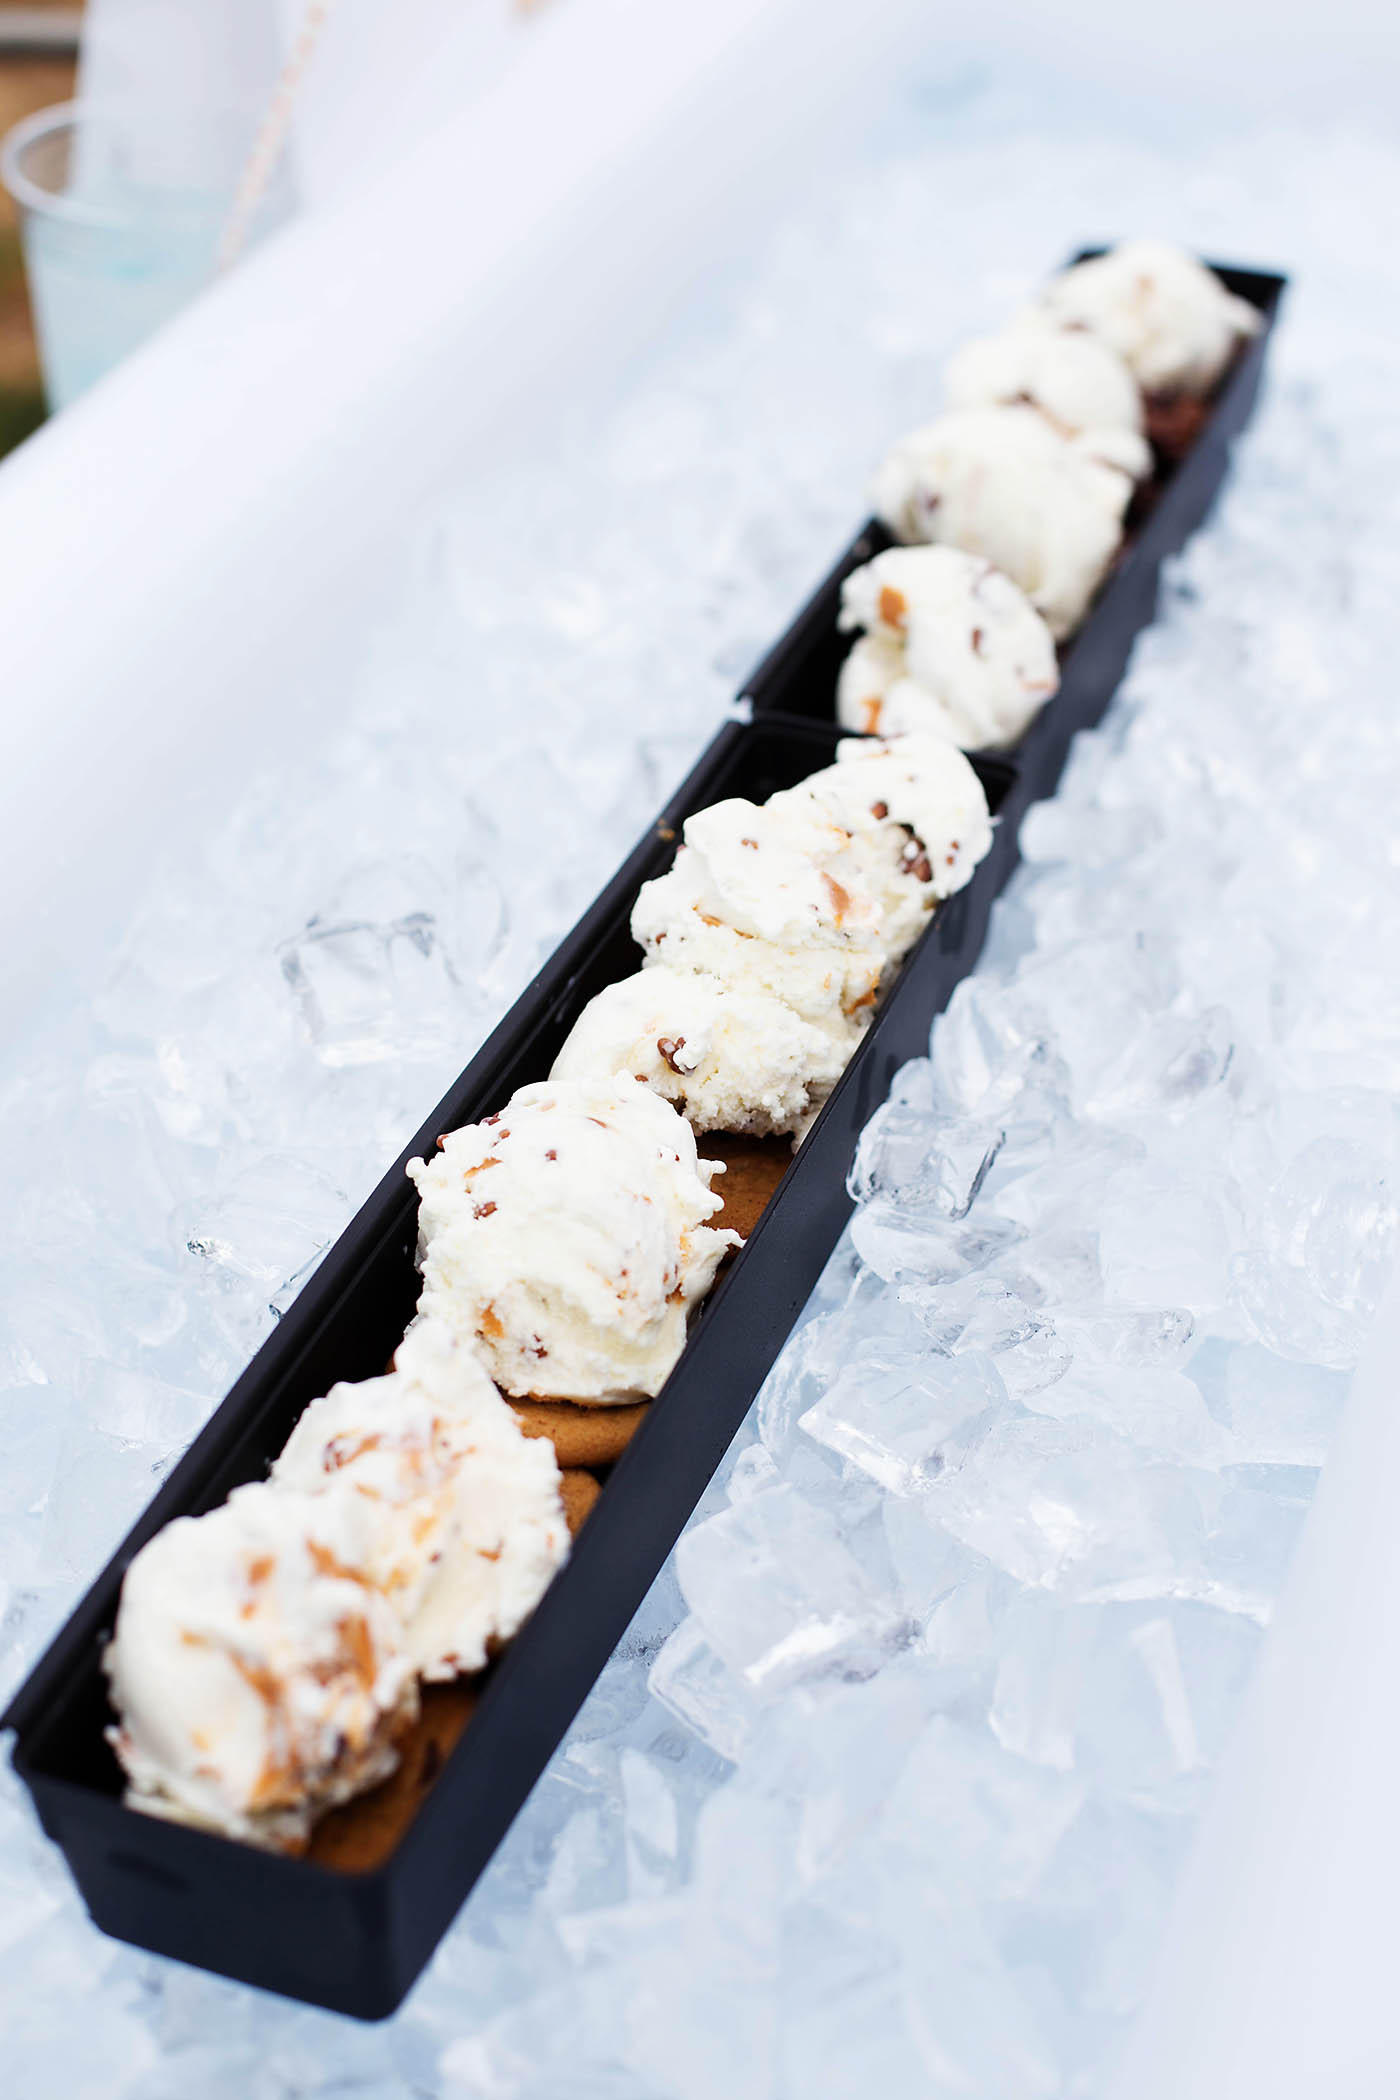 aftb-summer-ice-cream-party-15